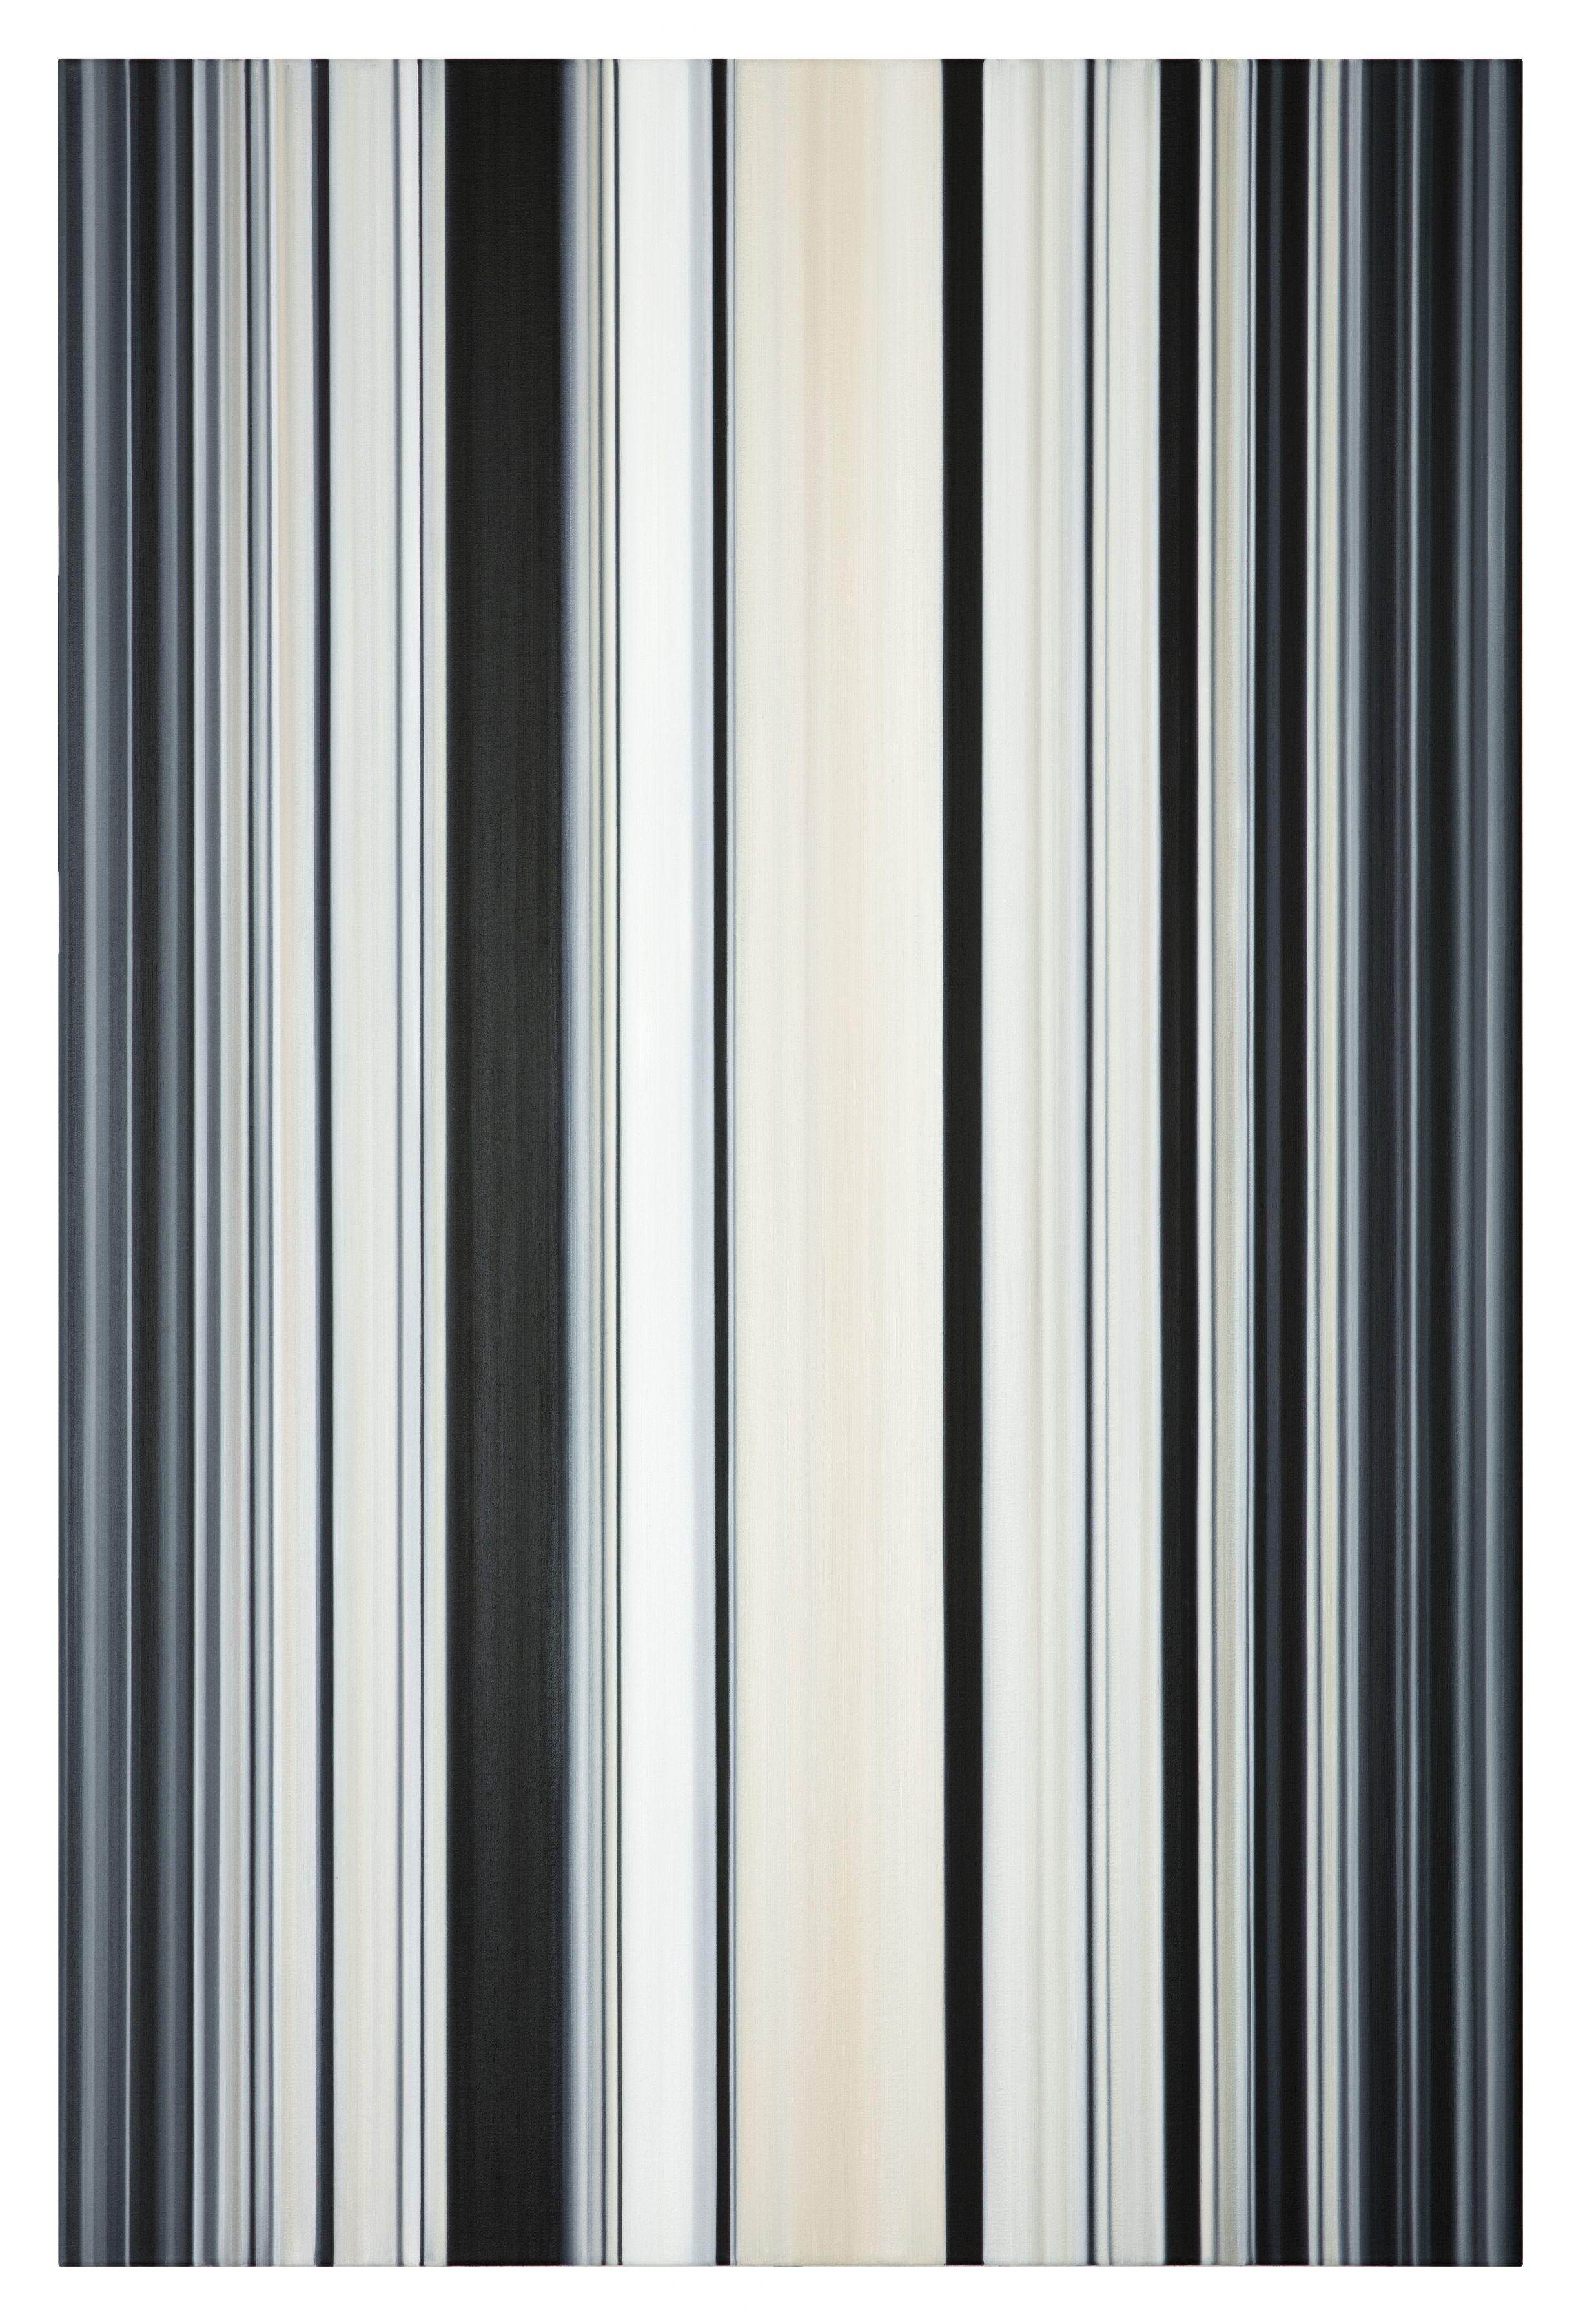 Cornelia Thomsen, Stripes Nr. 104, 2016